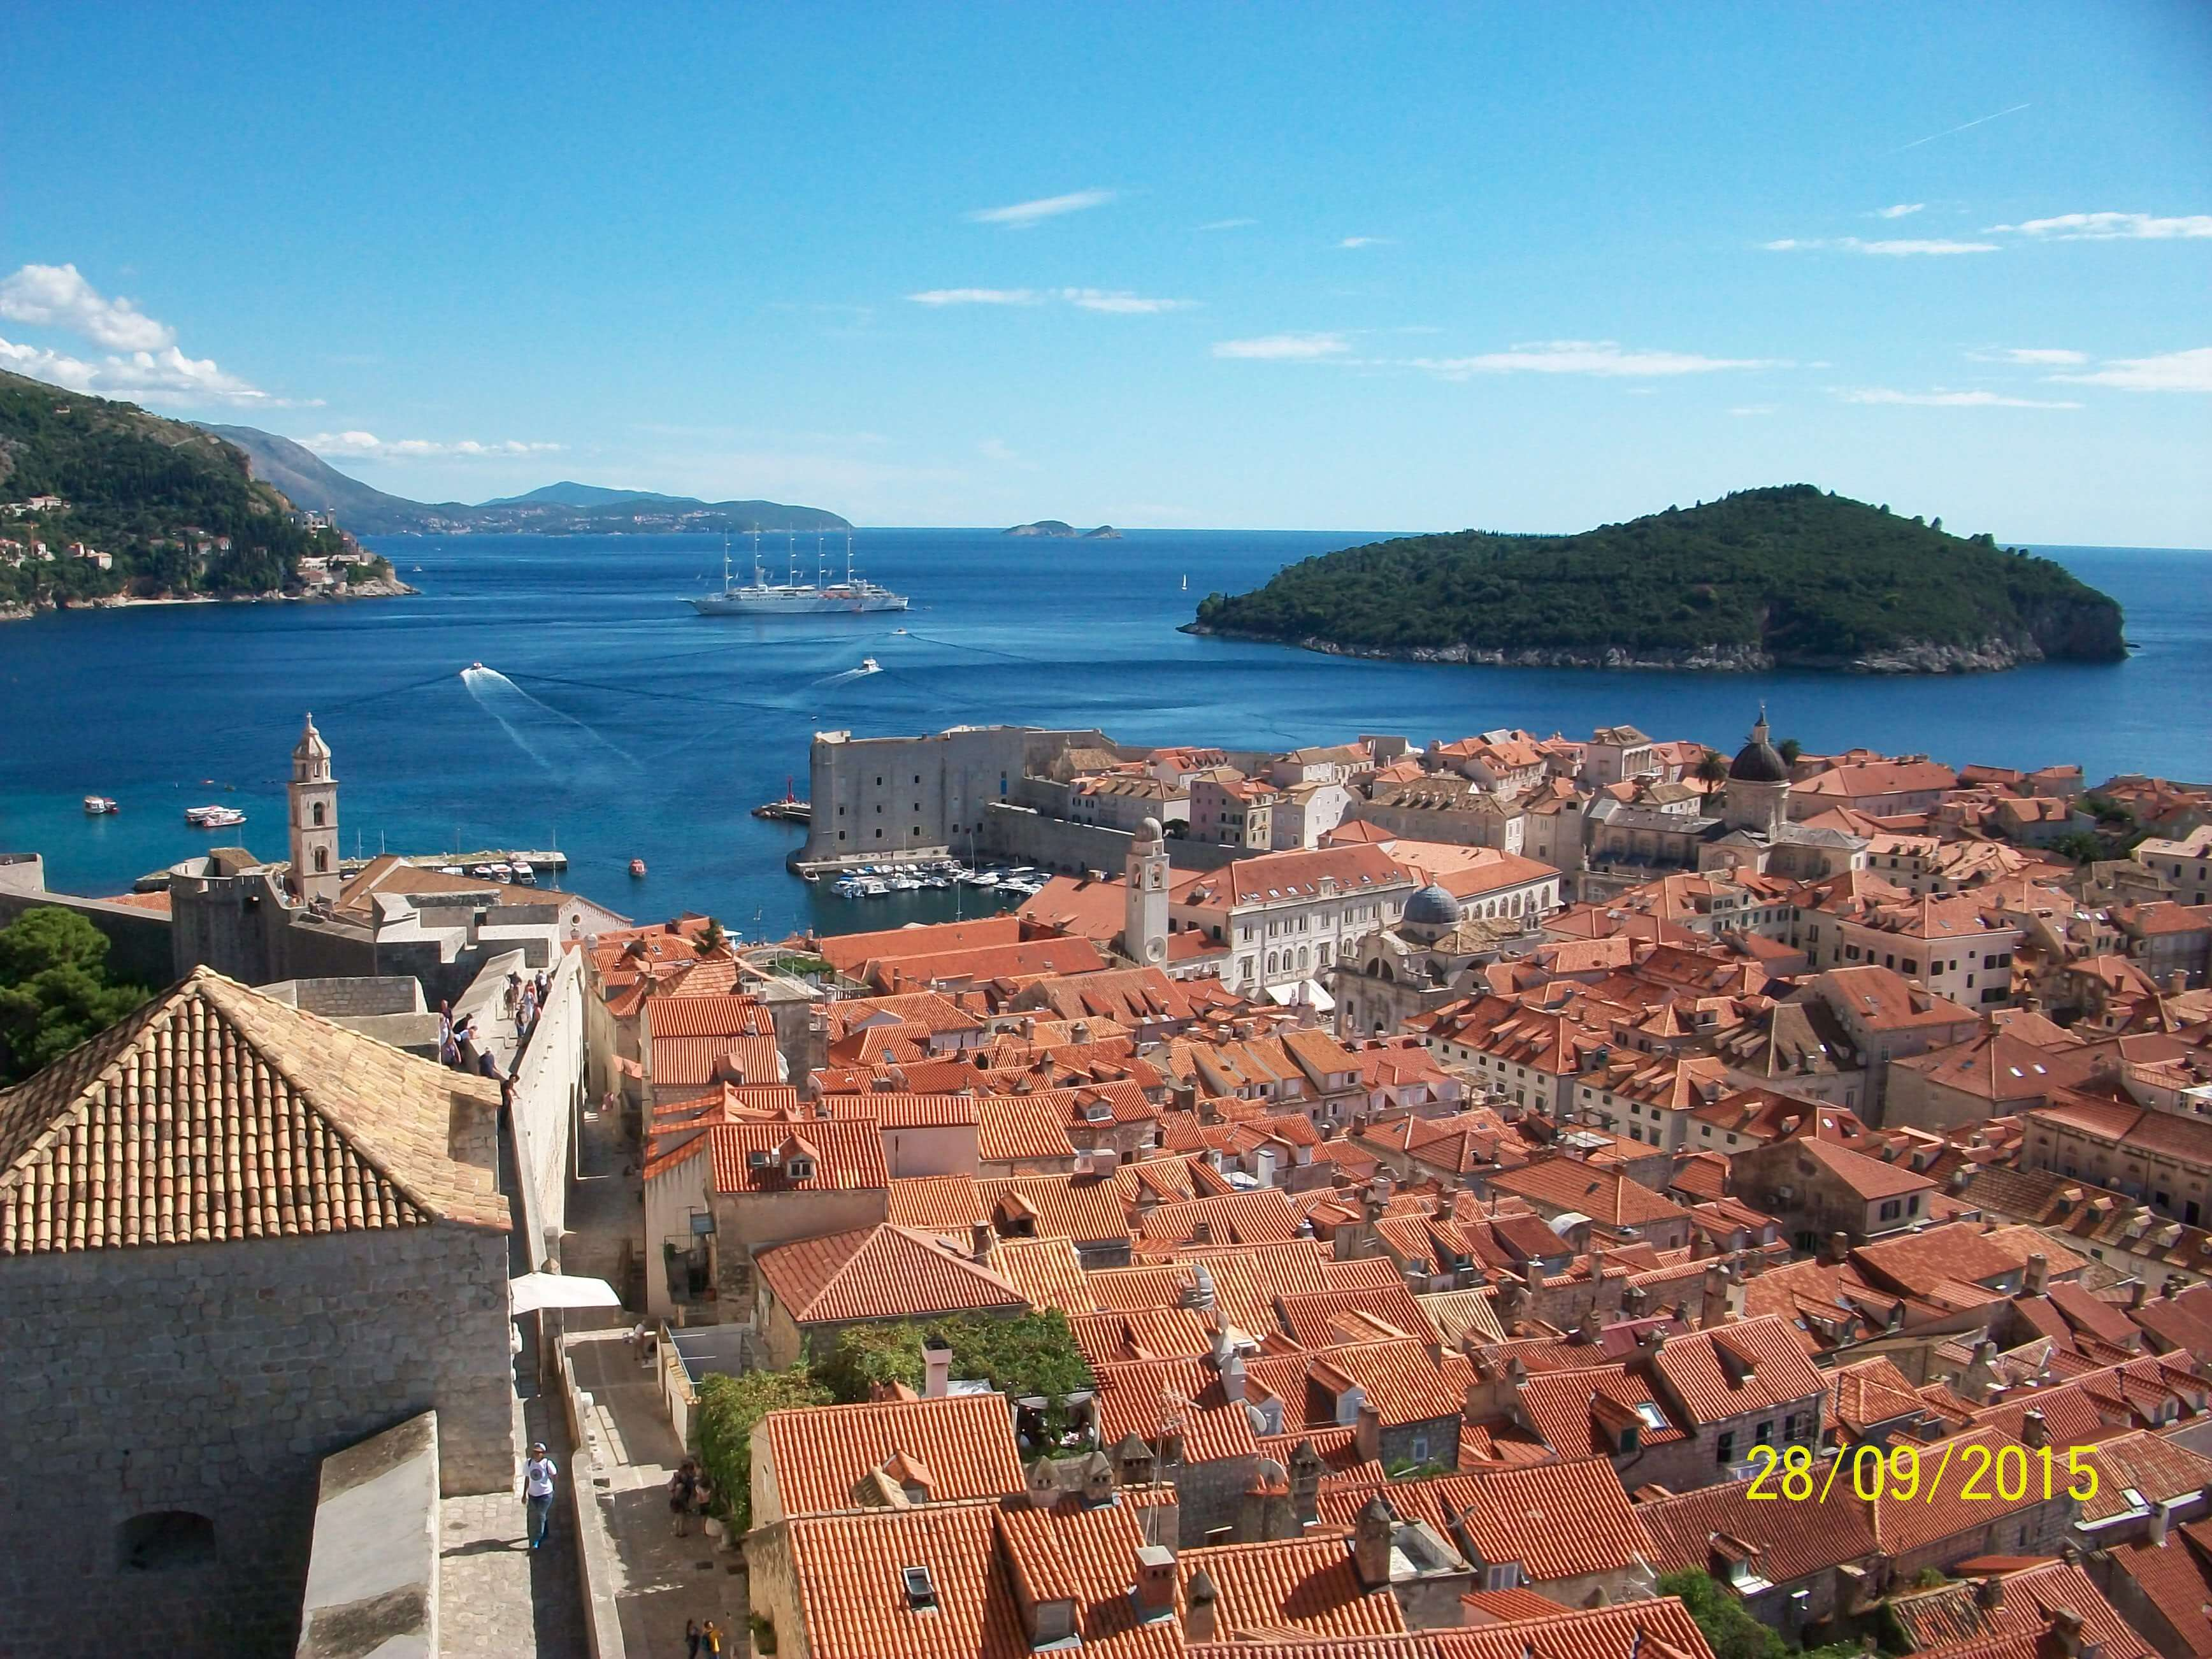 Cosas que deberías saber sobre Croacia